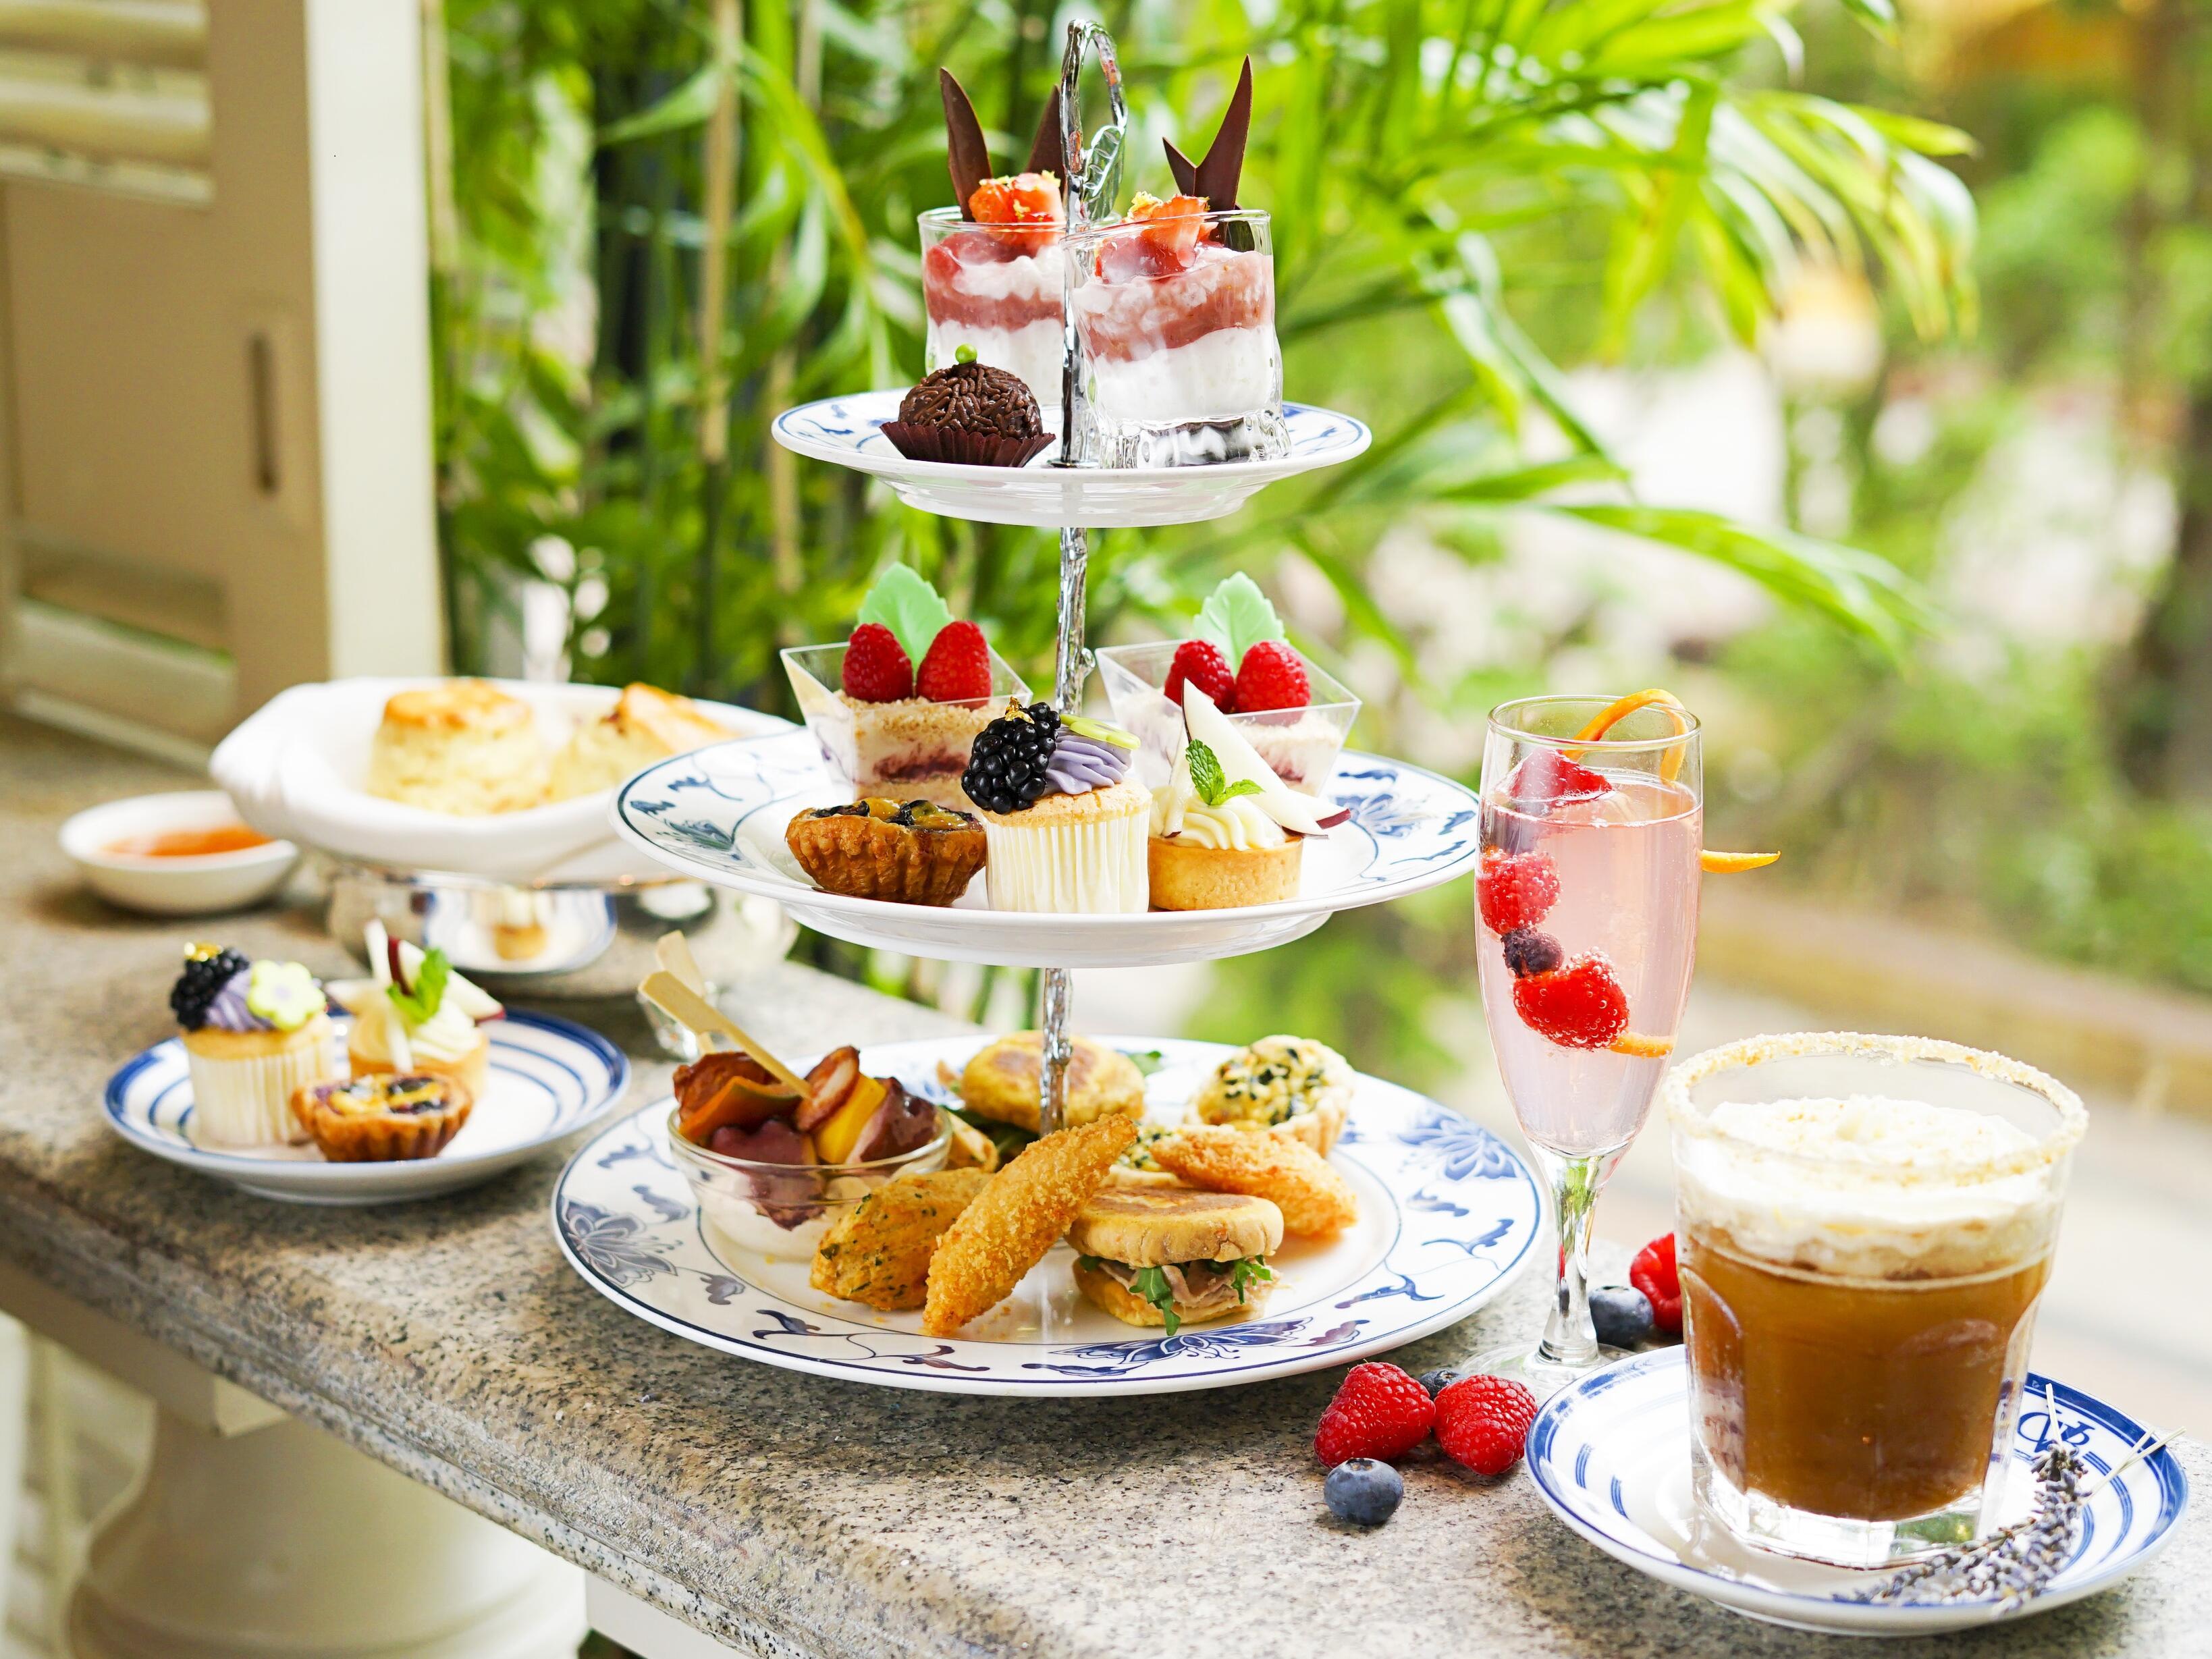 Breakfast at Artyzen Grand Lapa Hotel Macau